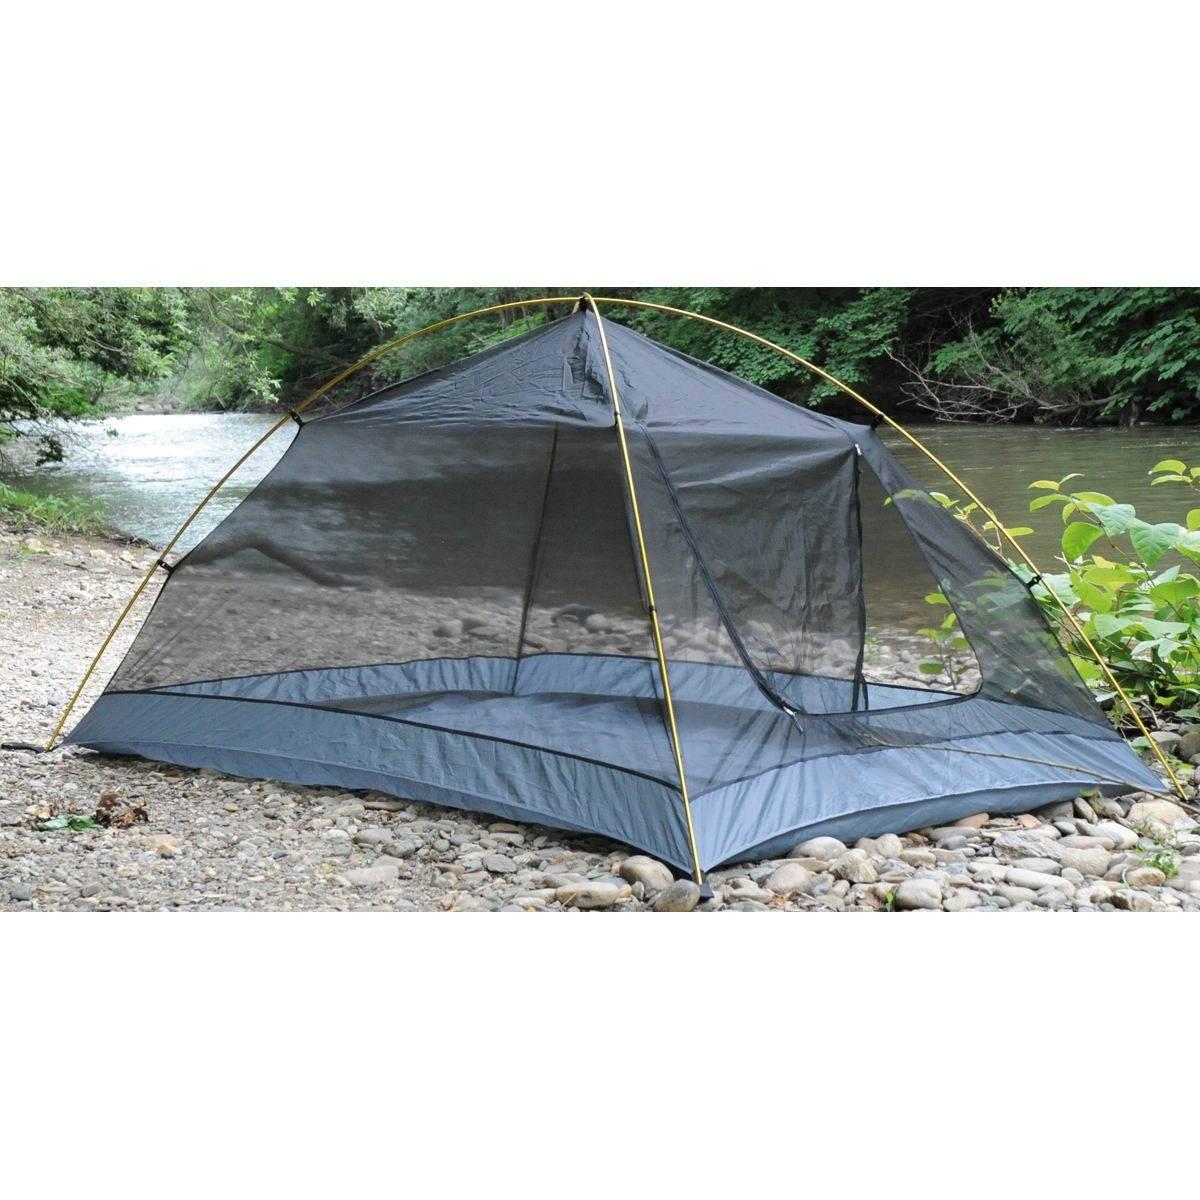 COCOON Mosquito Dome Double - no-seeum - Bild 2